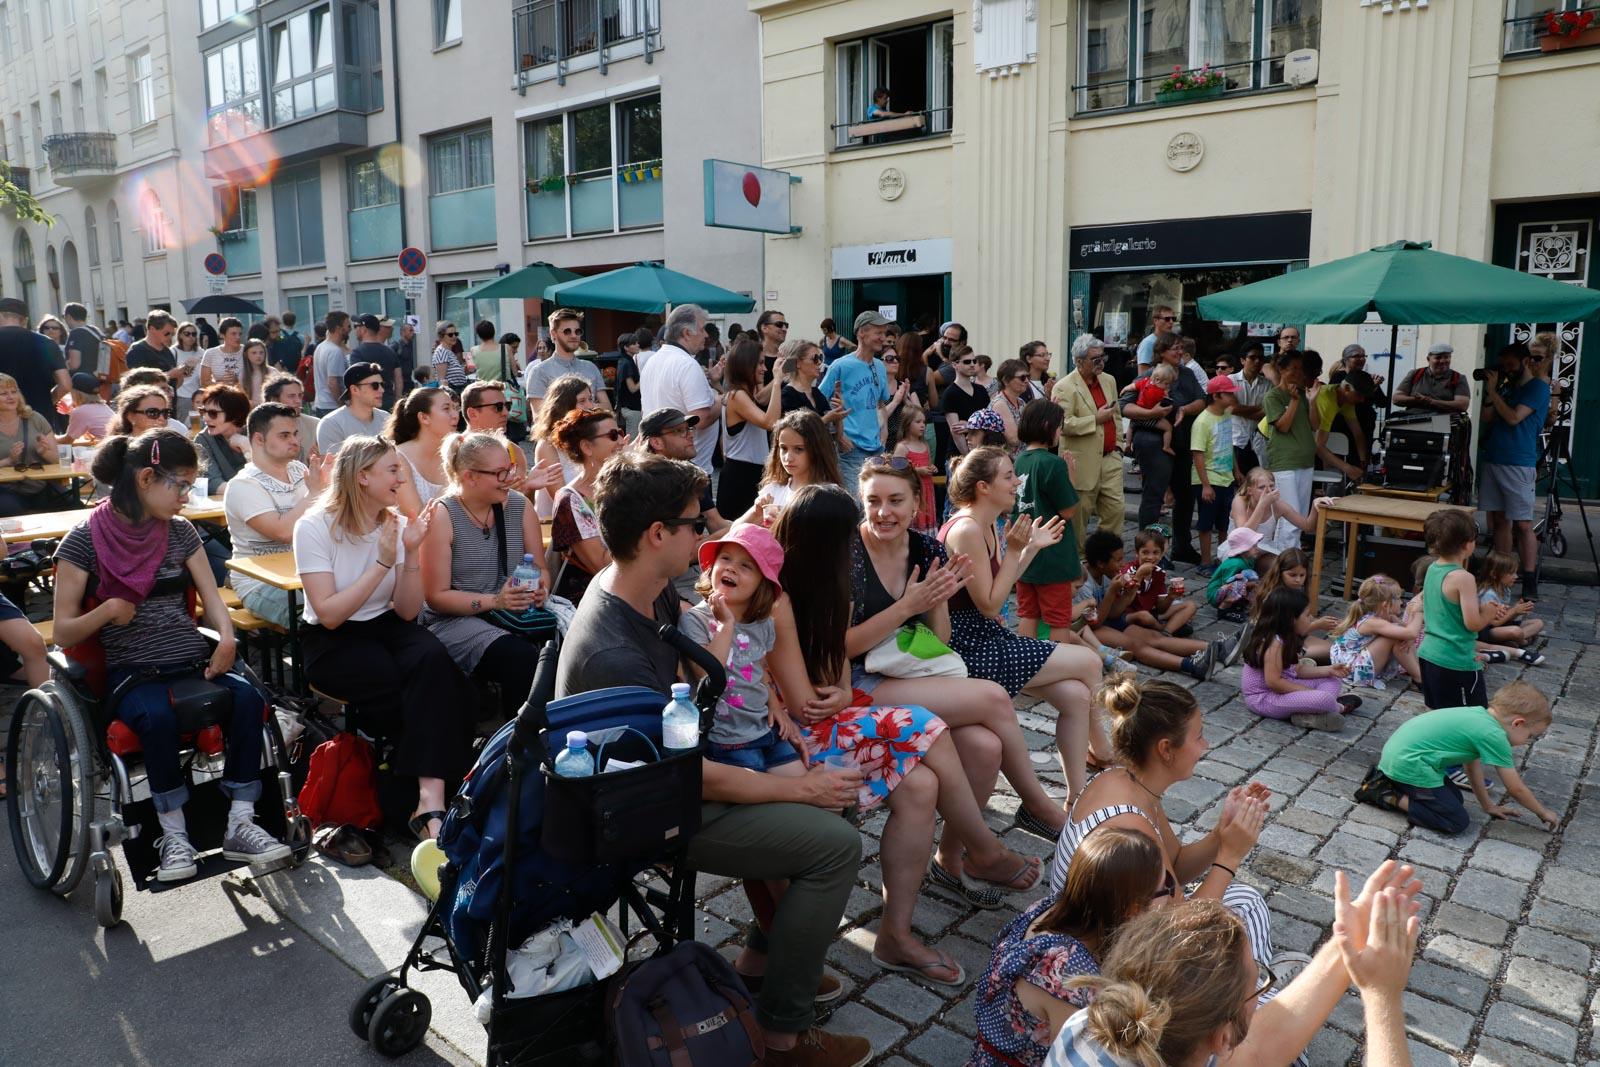 Sommerfest im Nibelungenviertel